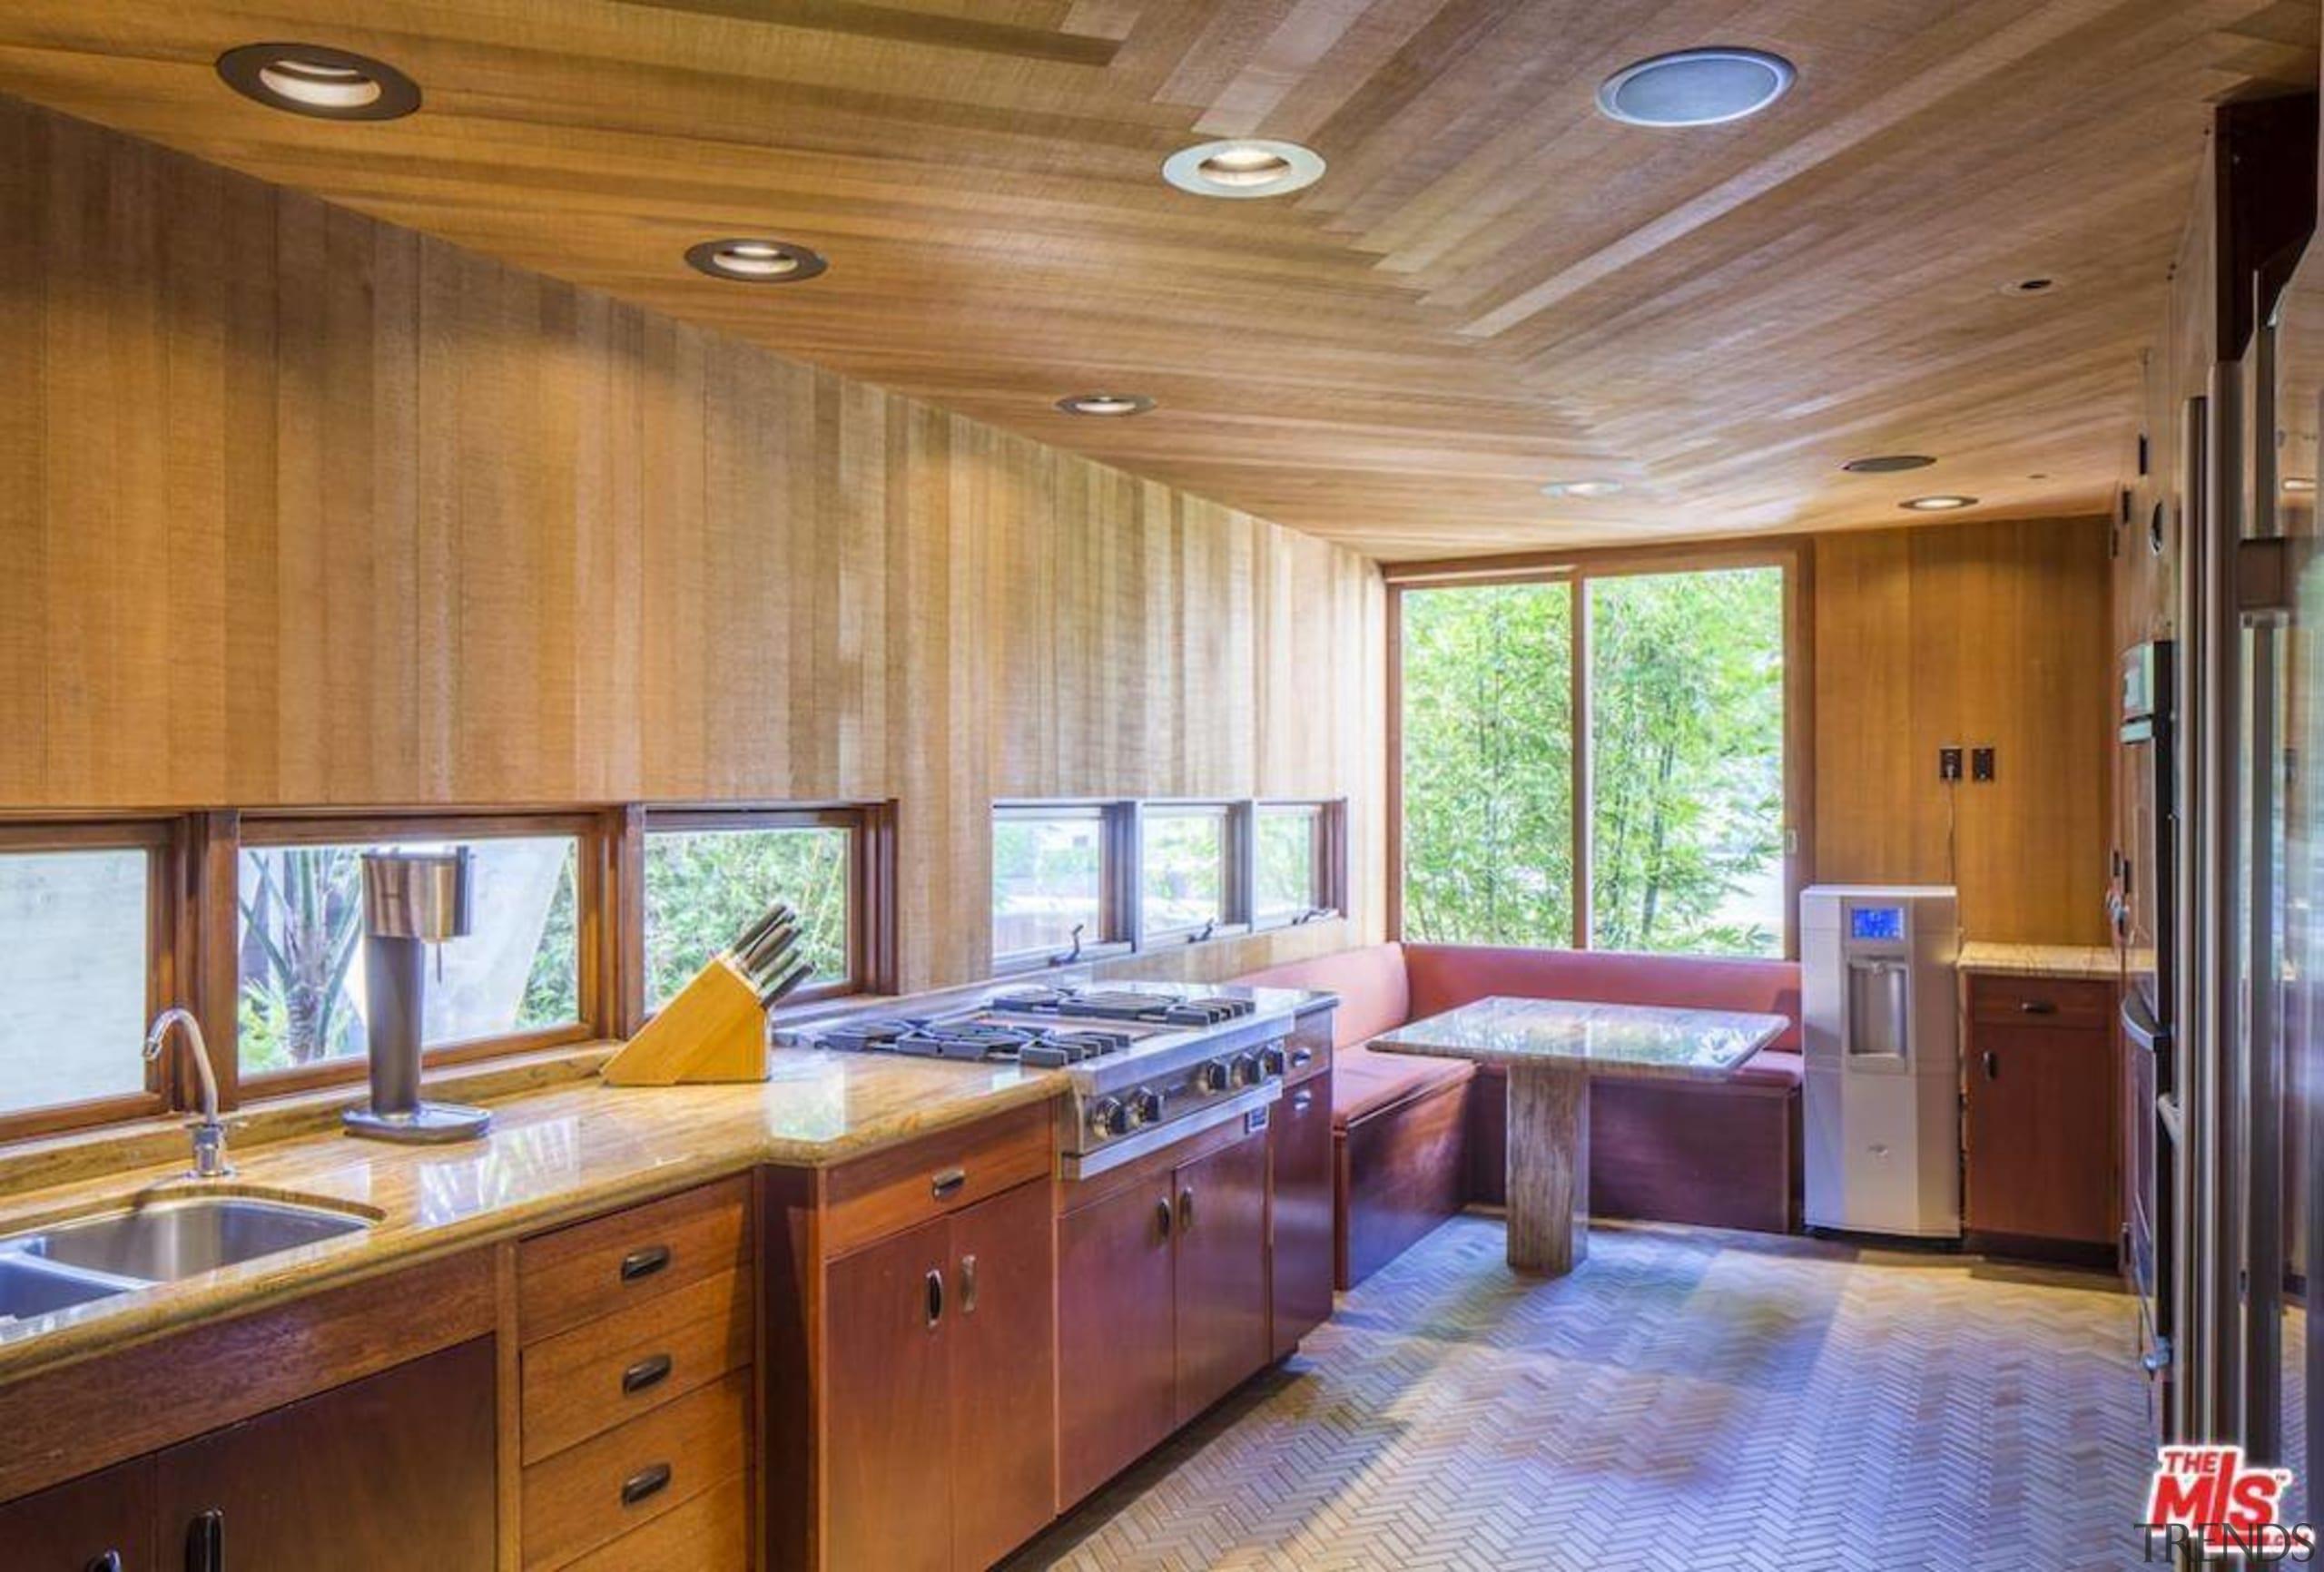 Edward Norton's new Malibu Colony home – Trulia ceiling, countertop, estate, flooring, hardwood, home, house, interior design, kitchen, property, real estate, room, wood, brown